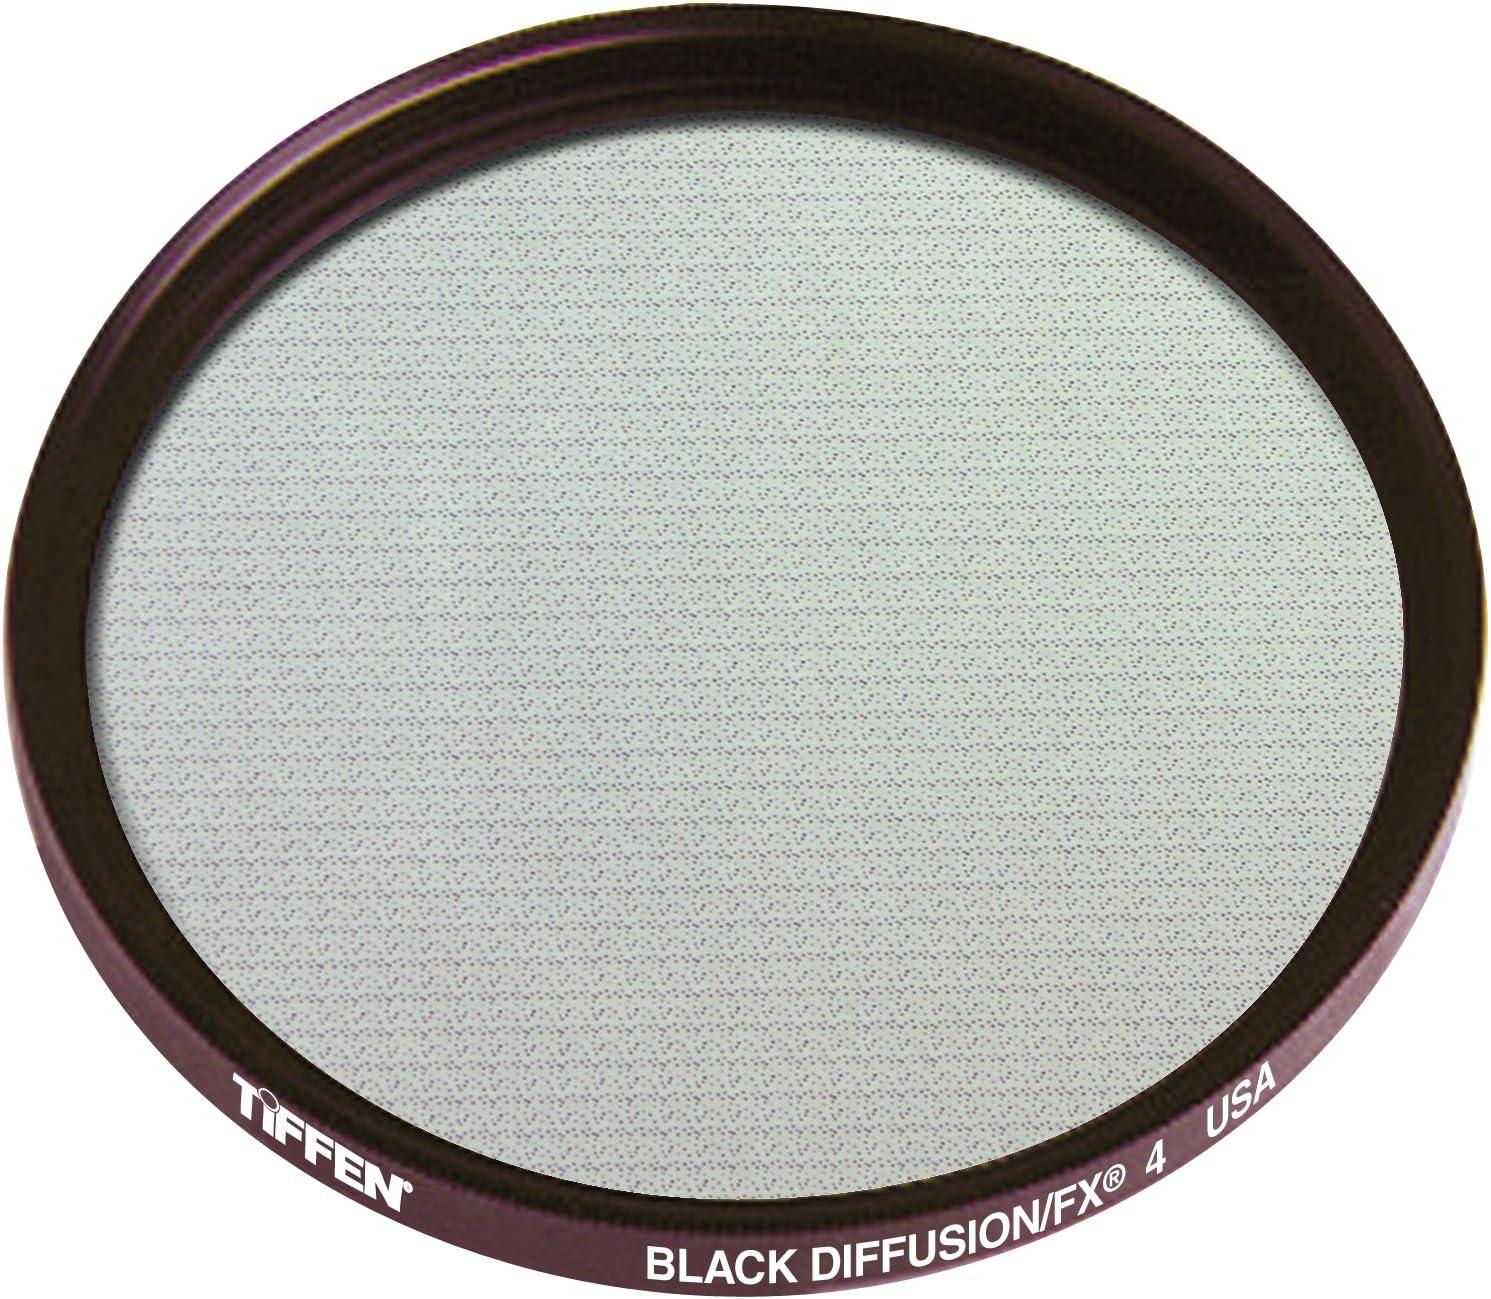 Tiffen Series 9 Black Diffusion FX 4 Round Glass Filter